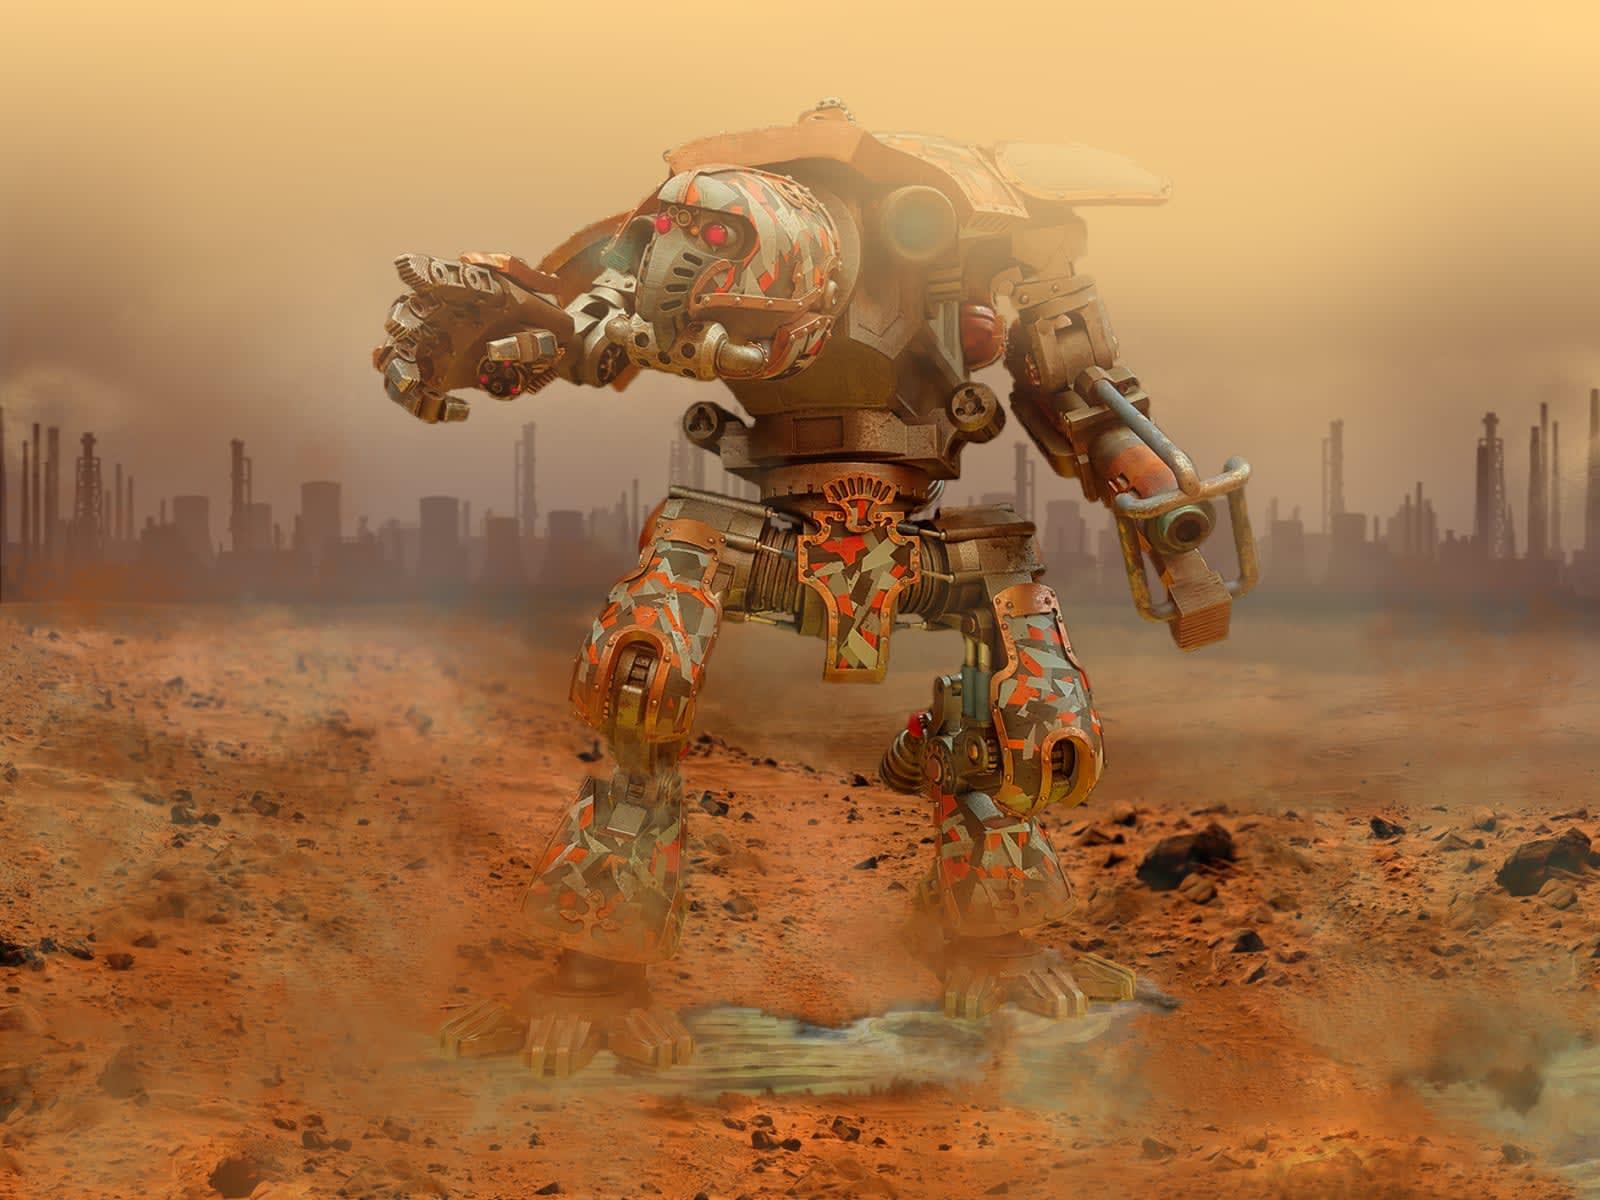 Thomas-Bull-Machine-of-War-illustration.jpeg